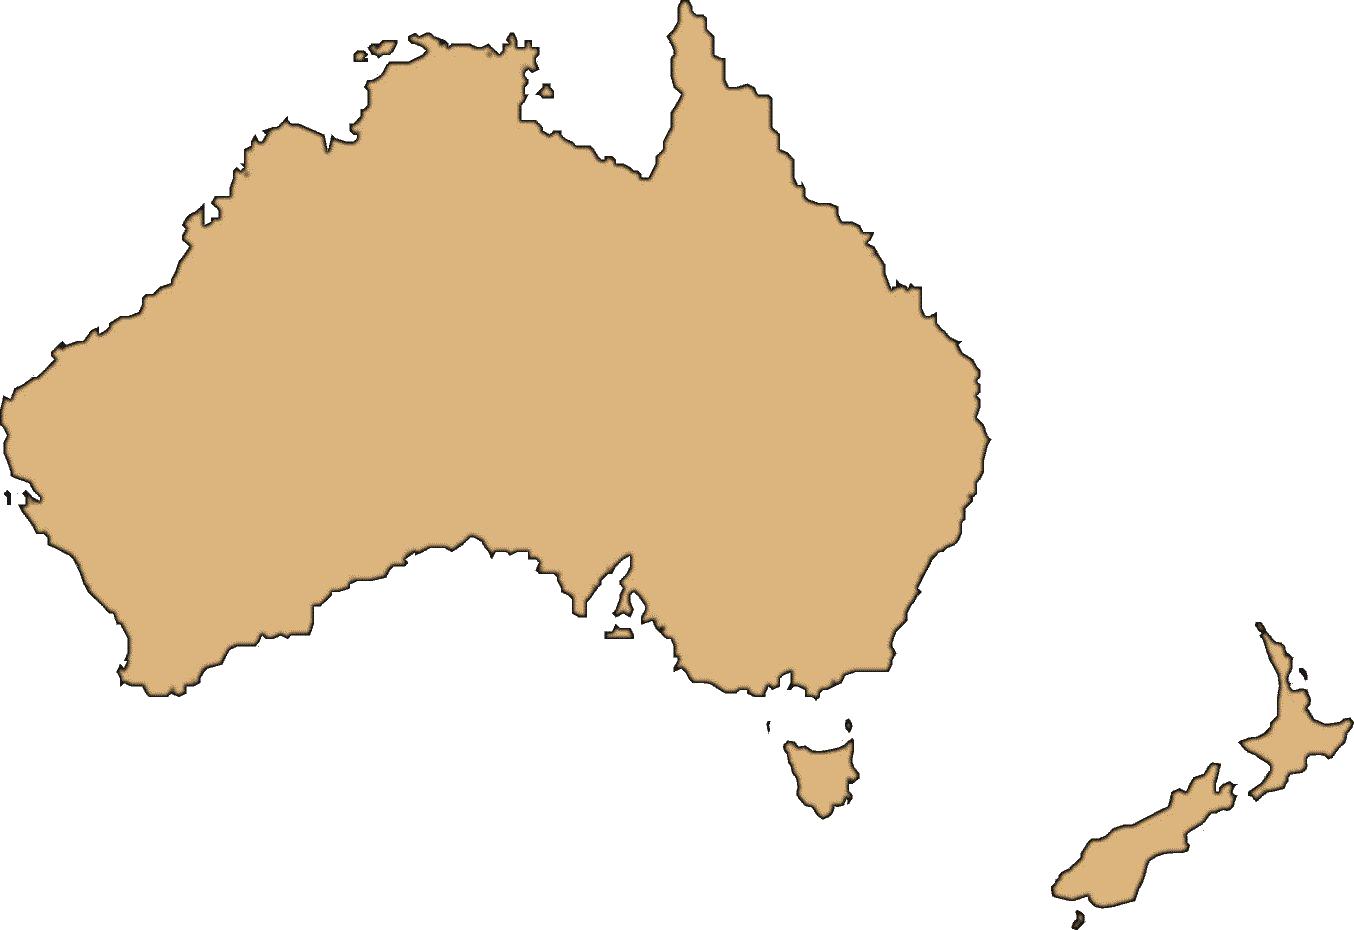 PNG File Name: Australia PlusPng.com  - Australia PNG